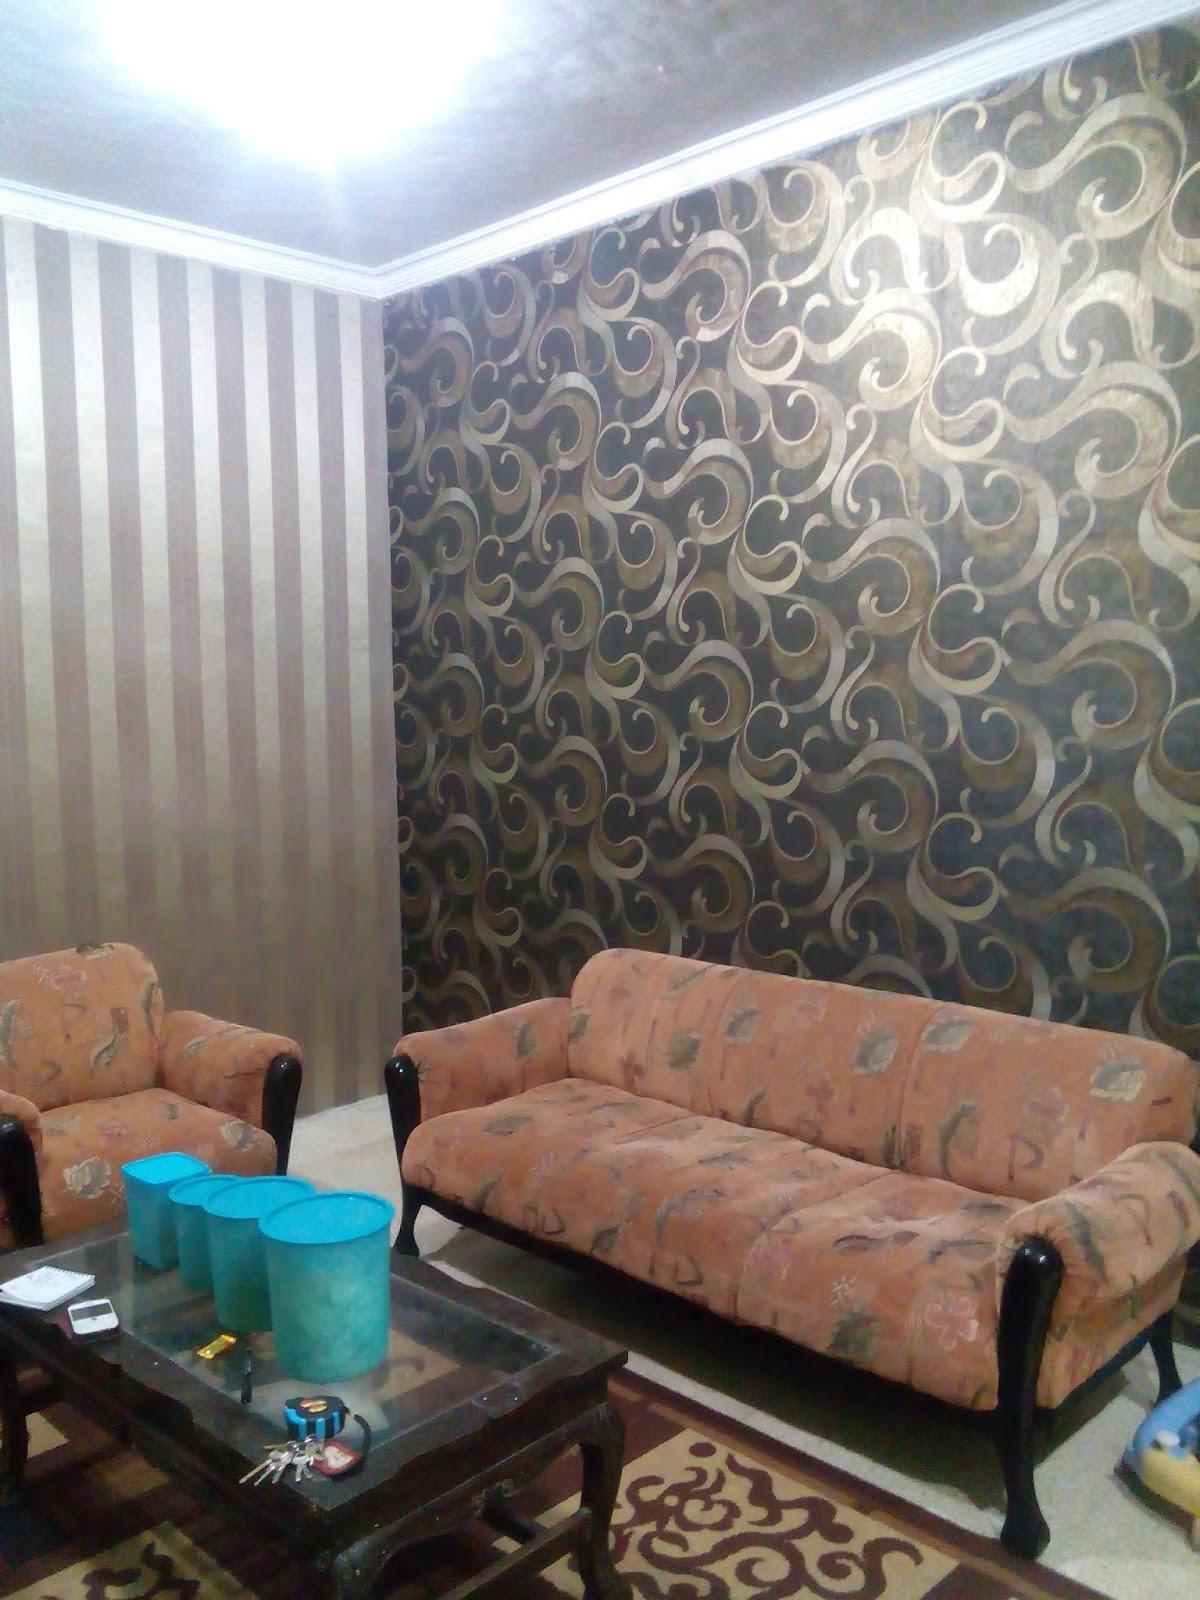 0821 3267 3033 Wallpaper Dinding Malang Wallpaper Dinding